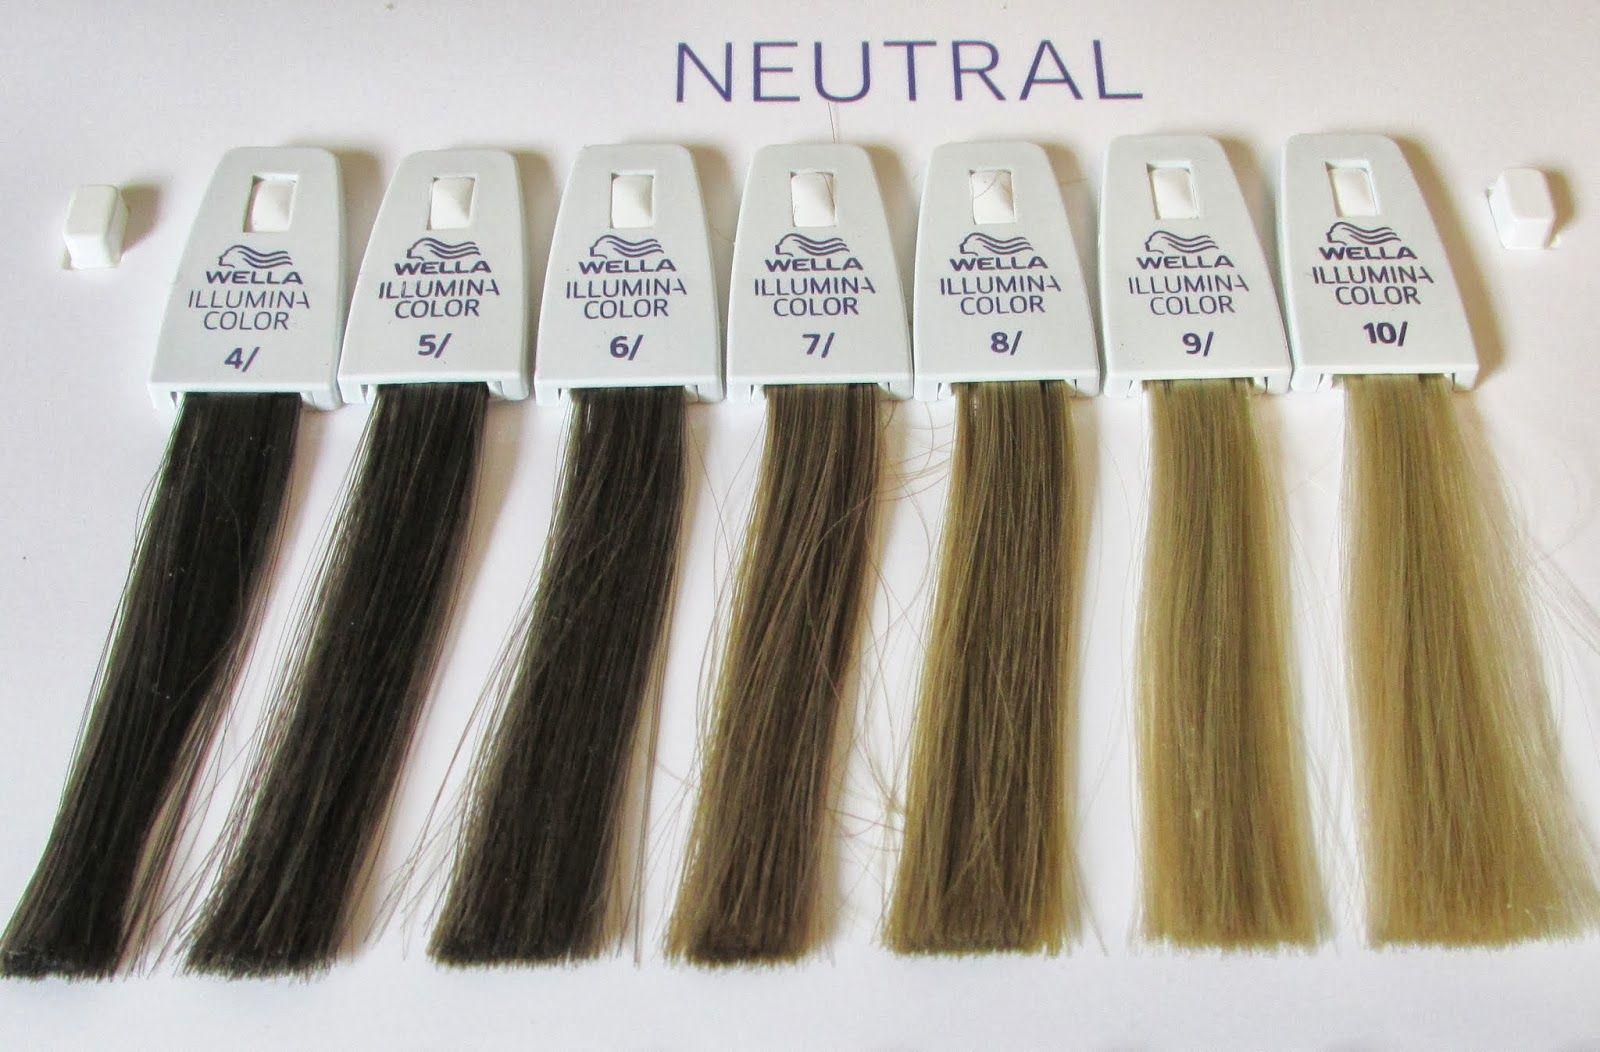 Wella illumina hair colors illumina hair color shades hair